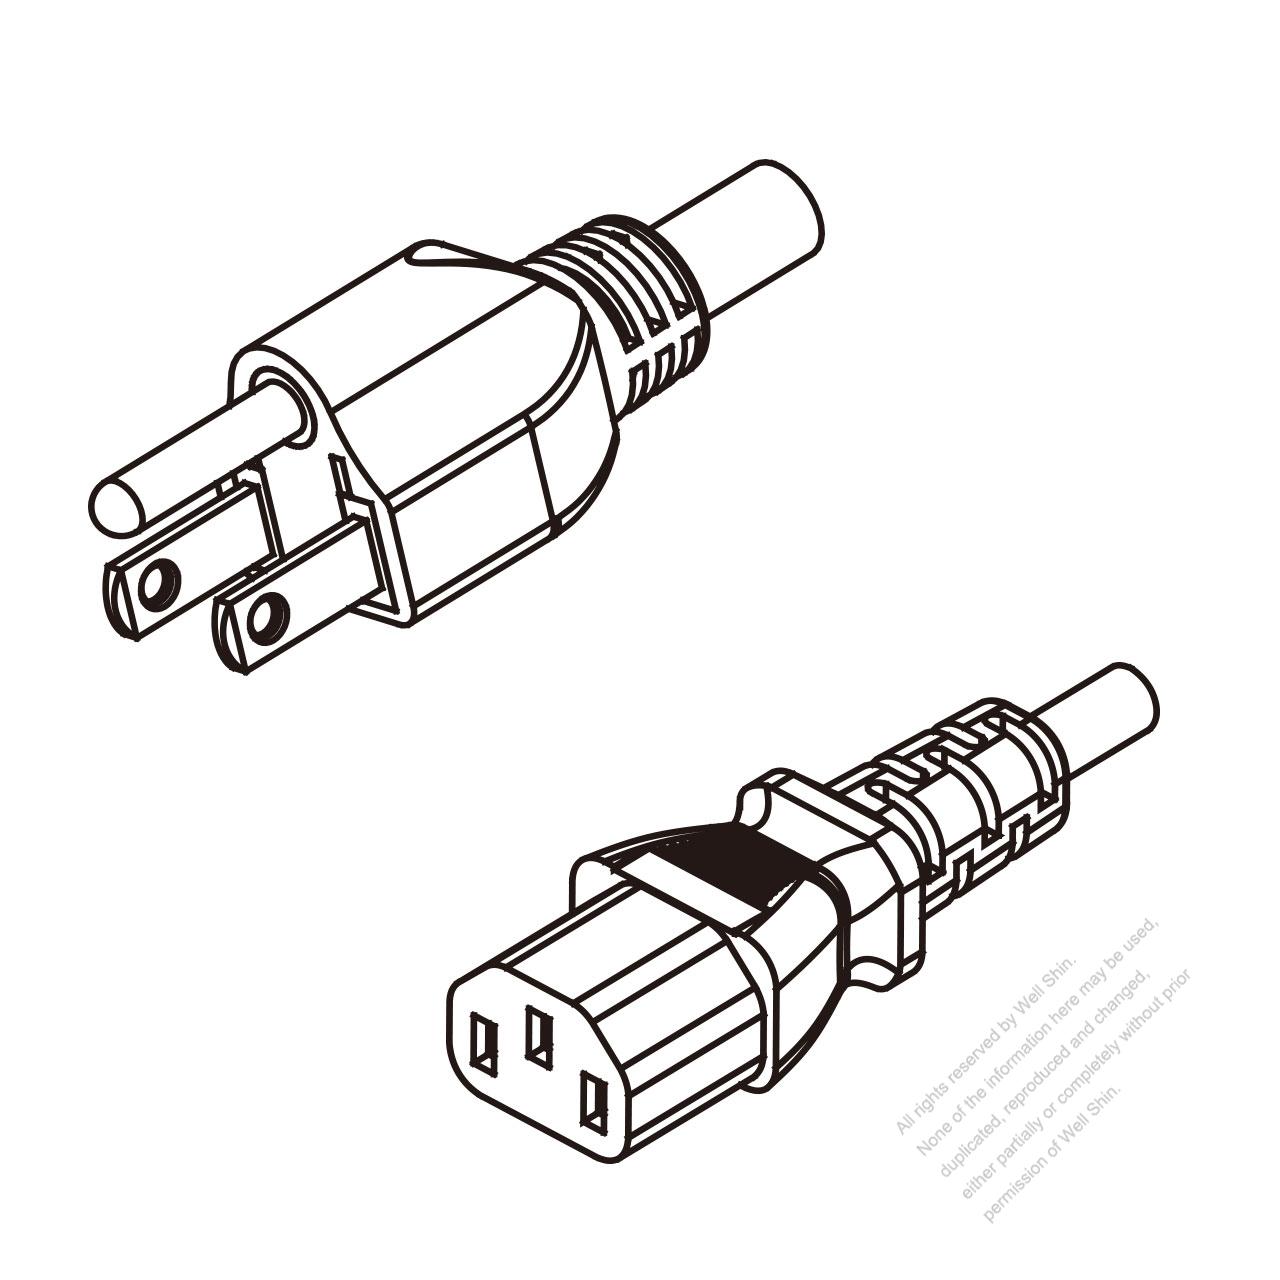 Ka24e Oiling Diagram Schematics Wiring Diagrams Engine 3406e Cat Belt 3176 Elsavadorla Radiator